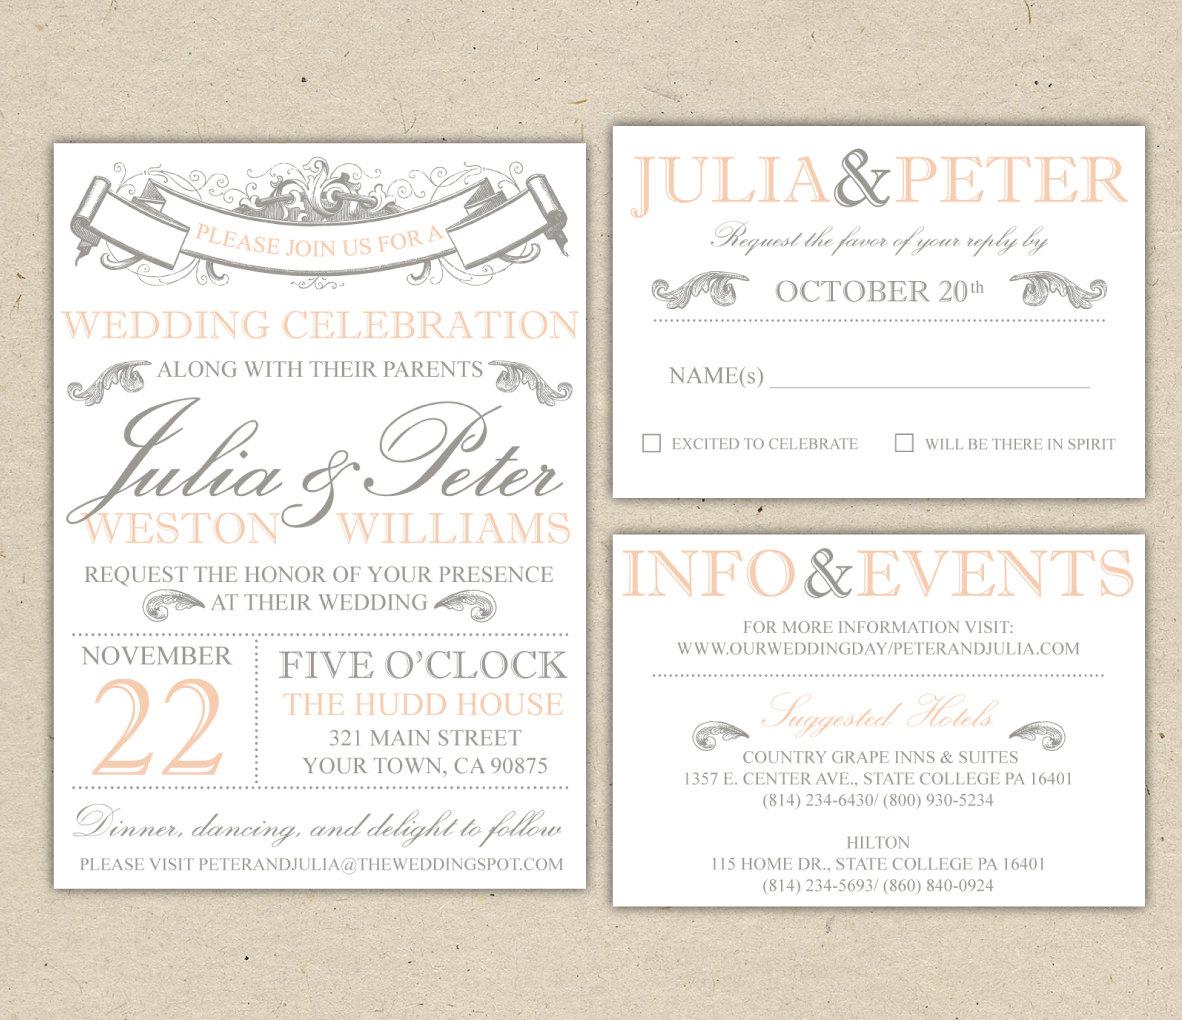 Printable Wedding Invitations Templates Free Wedding Invitation Templates For Word Marina Gallery Fine Art